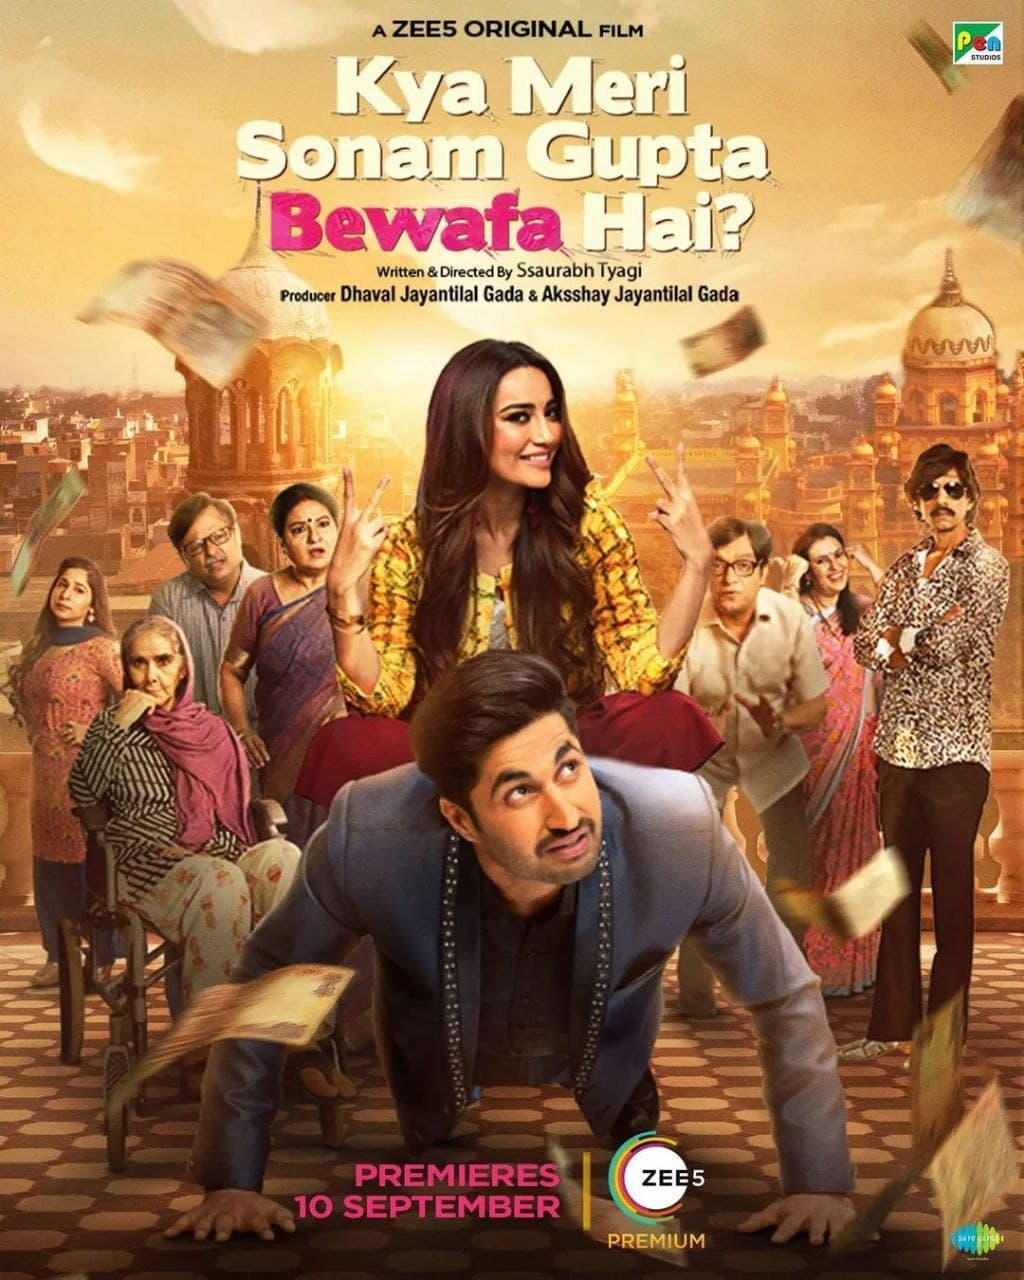 Kya Meri Sonam Gupta Bewafa Hai (2021) Hindi Full Movie 480p ZEE5 HDRip x264 400MB Download